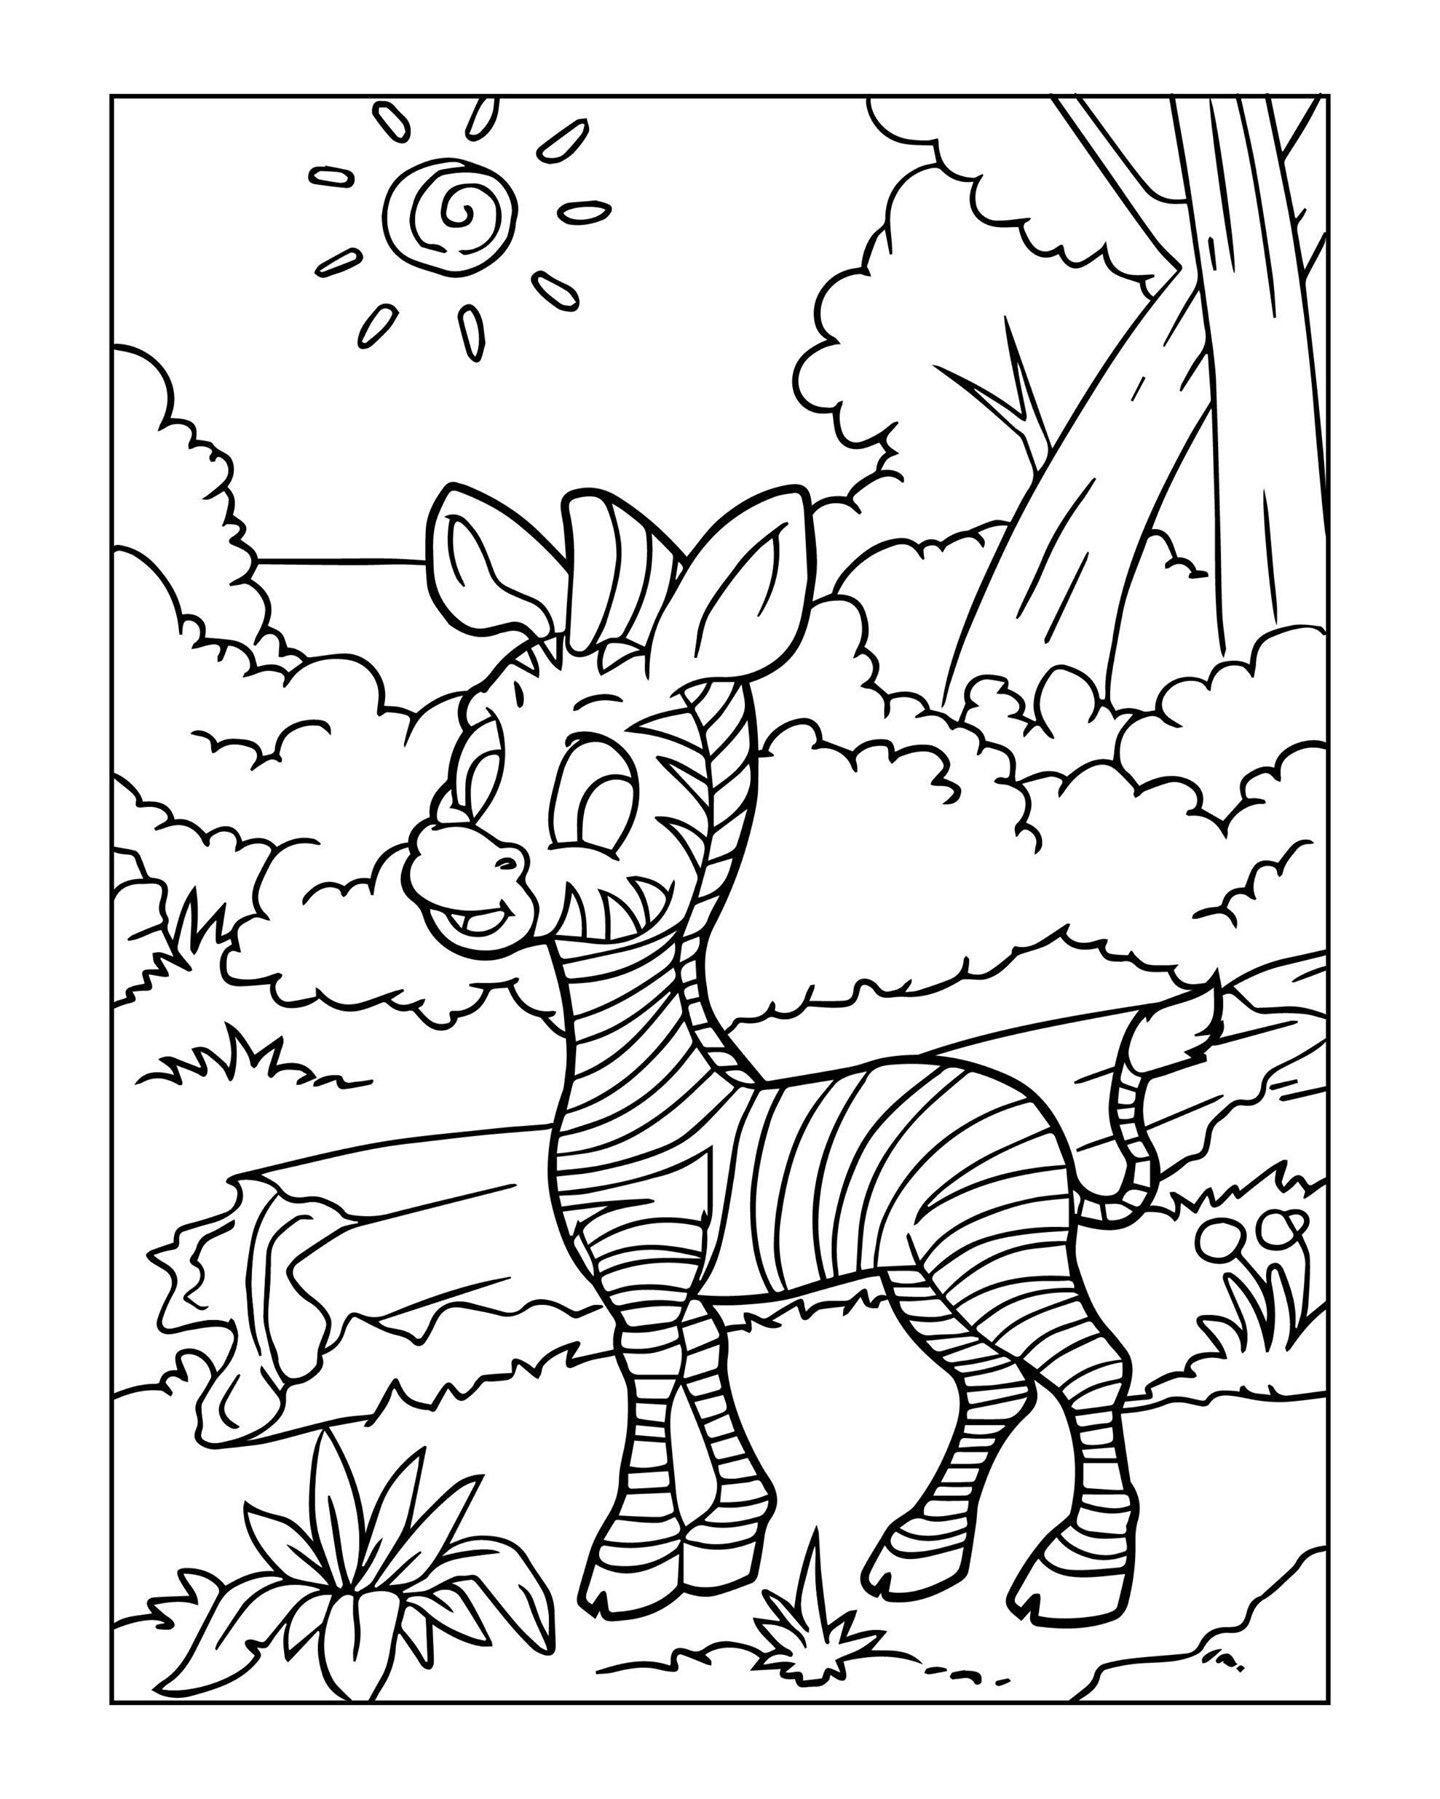 Zoo Animal Coloring Page 14 Zoo Animal Coloring Pages Zoo Coloring Pages Animal Coloring Pages [ 1799 x 1440 Pixel ]